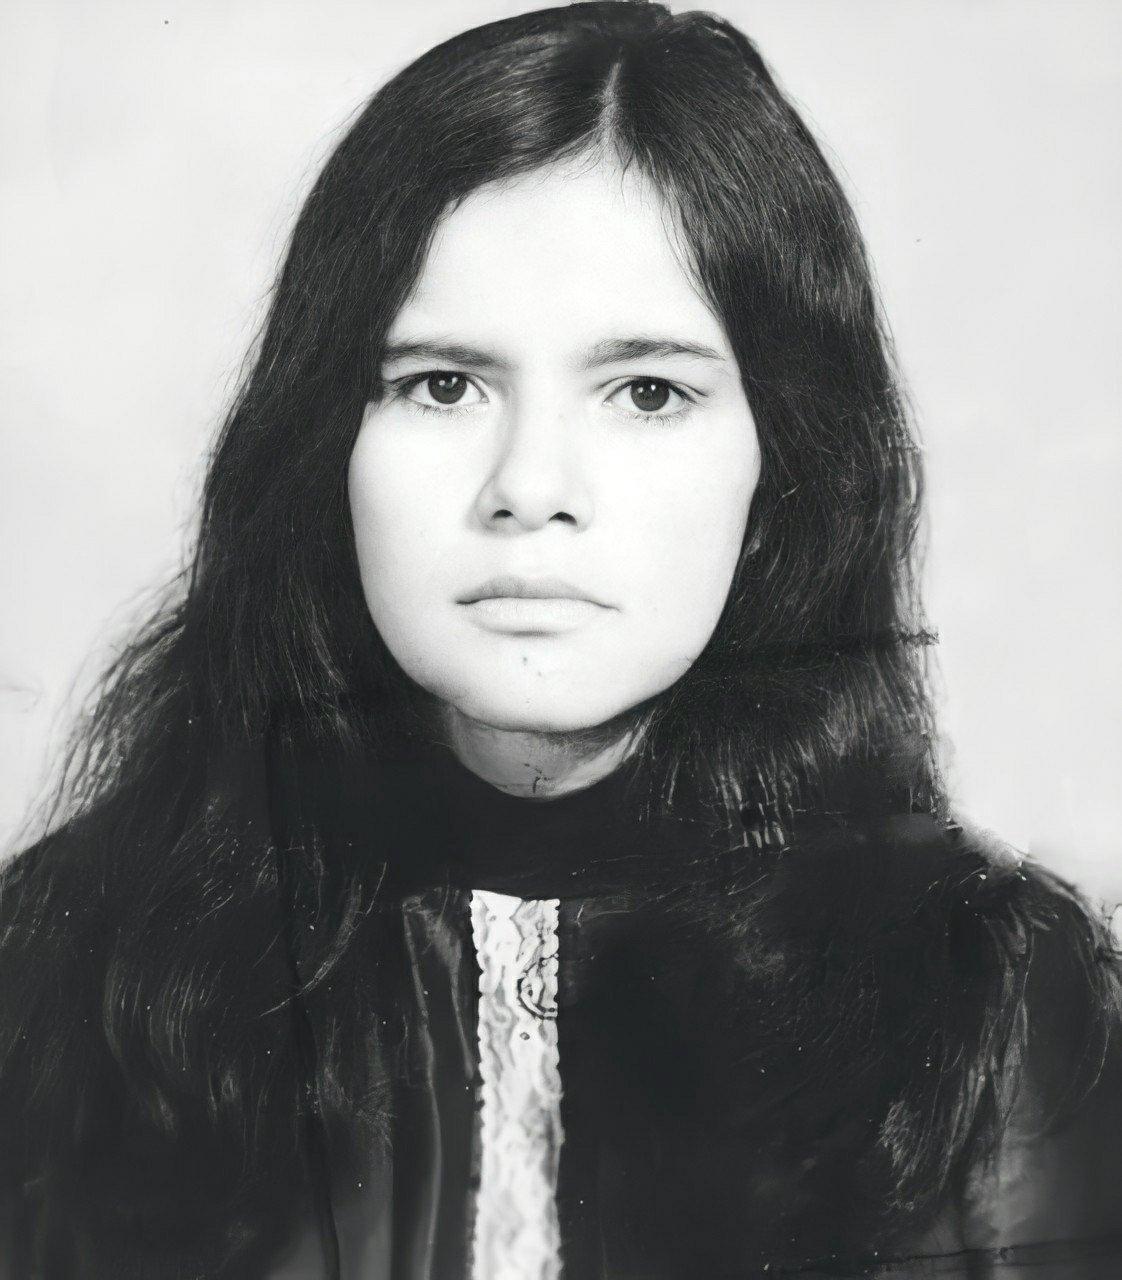 The Feral Child Marina Chapman